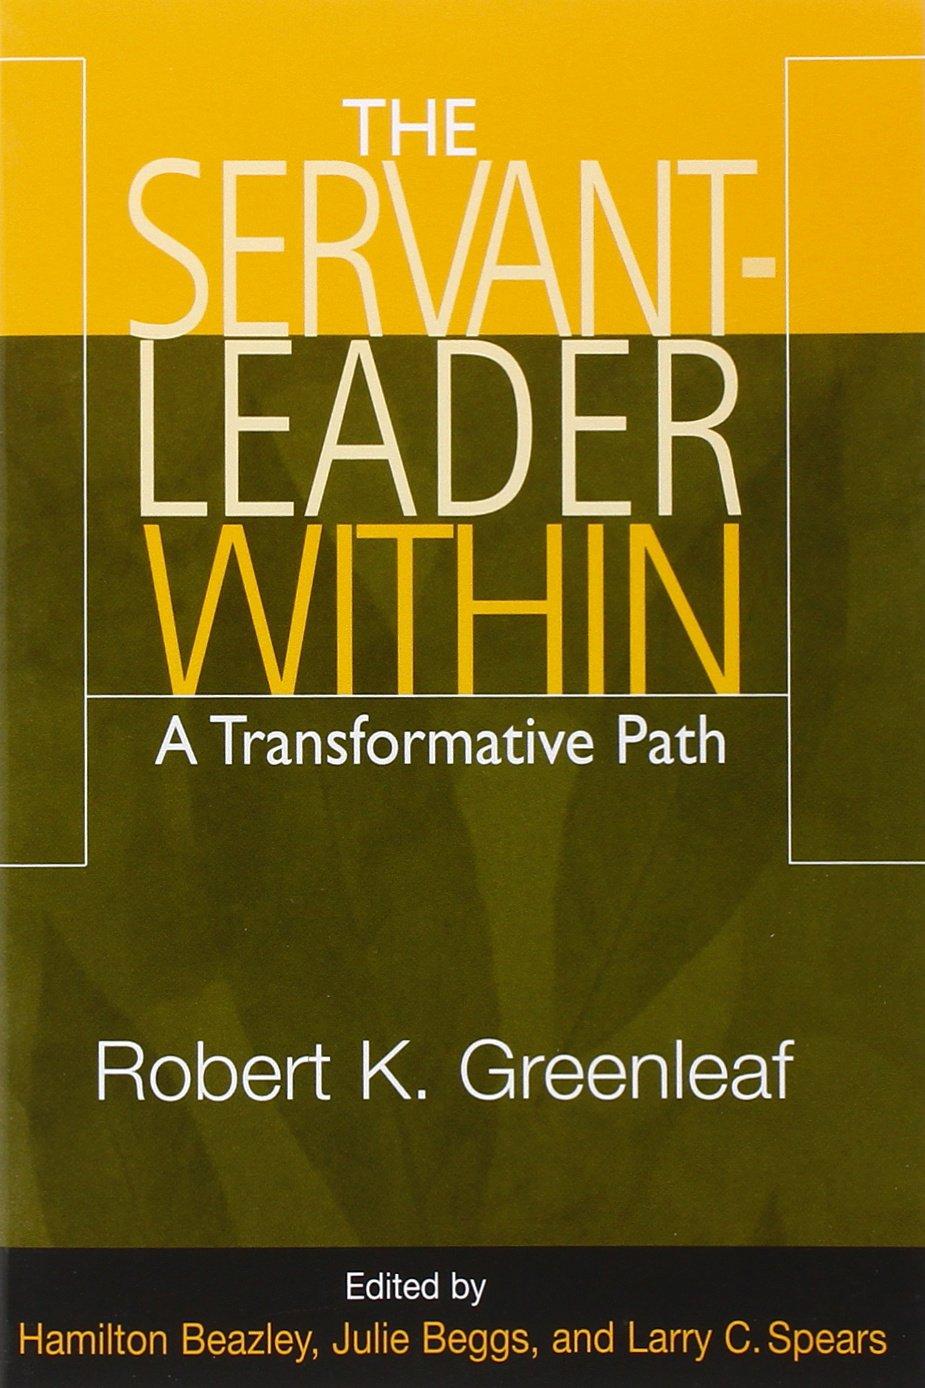 amazon com robert k greenleaf books biography blog the servant leader in a transformative path